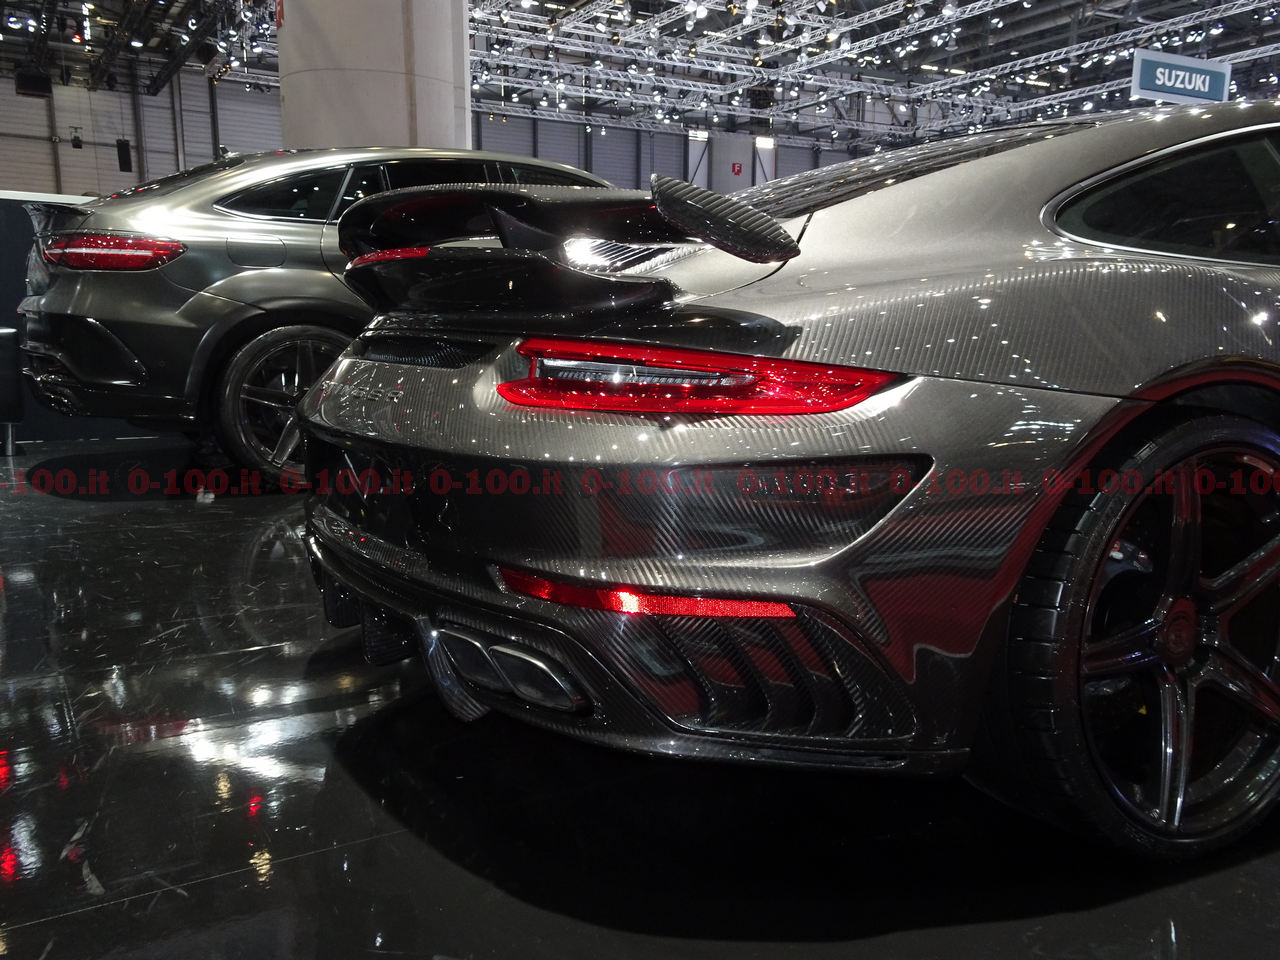 Geneve-ginevra-geneva-2017_tuning-top-car-porsche-991-2-gtr_0-100_7